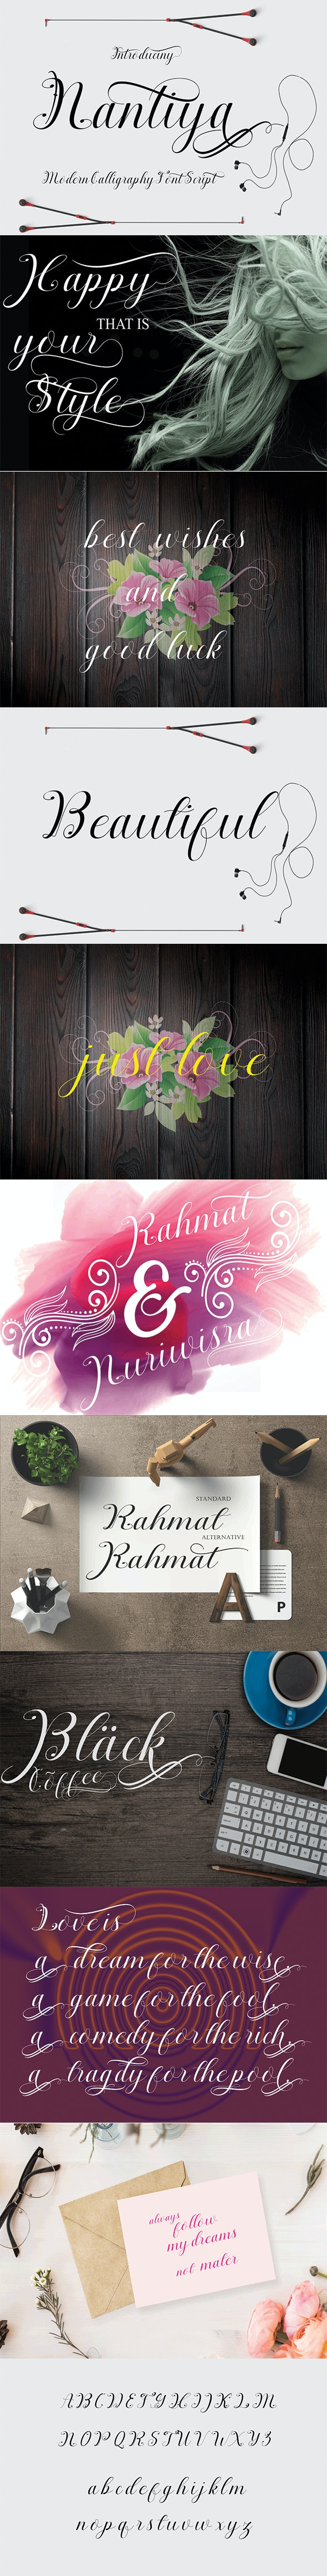 Nantiya - Script Fonts